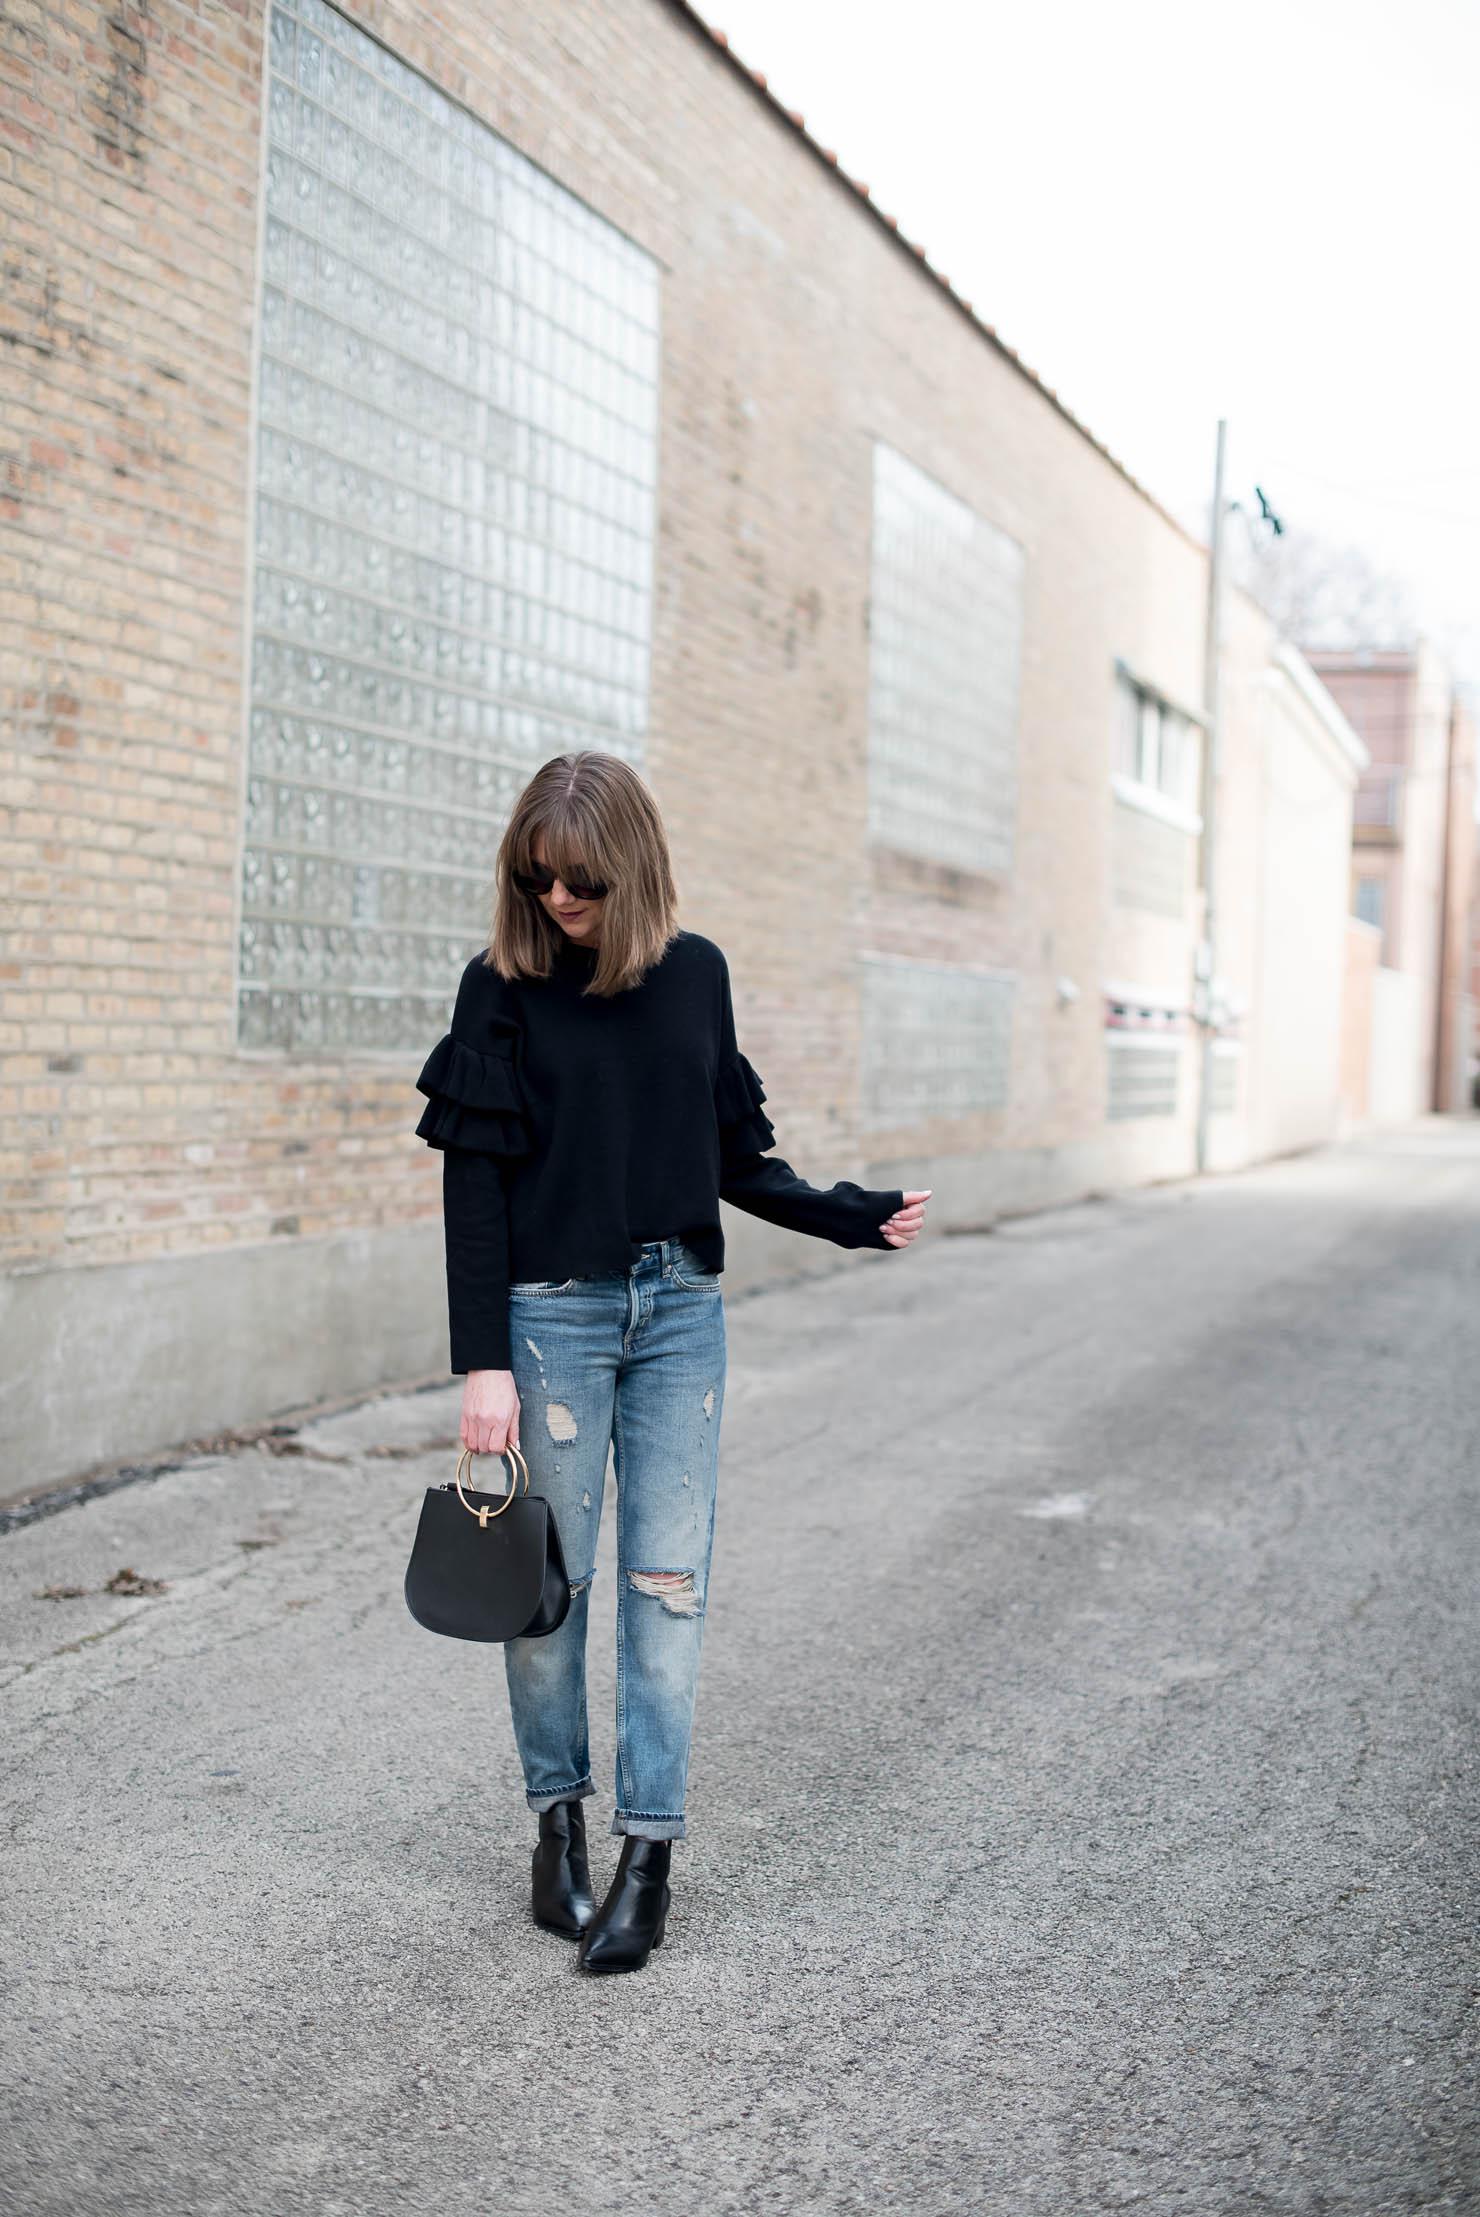 h&m-spring-fashion-2017-transitional-fashion-back-to-basics-ruffle-sleeve-sweater-boyfriend-jeans-minimalist-style